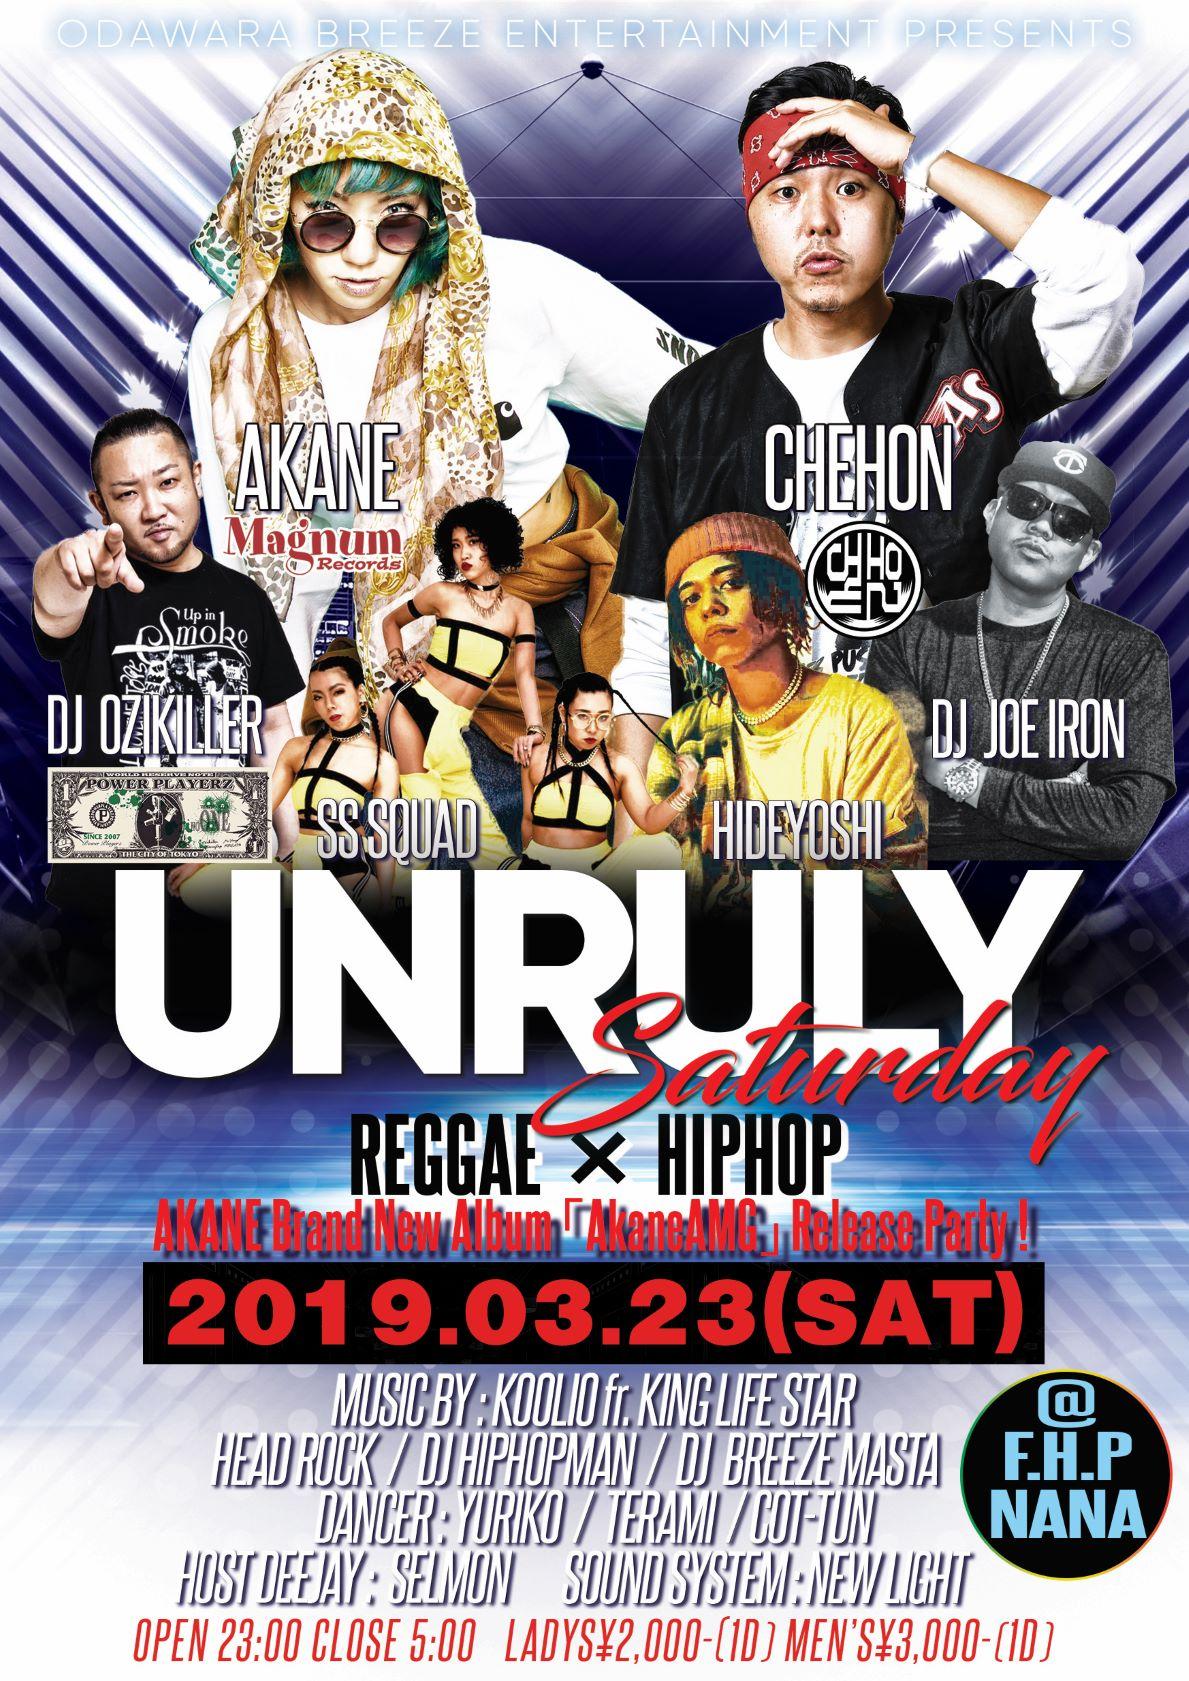 JOEIRON-Unruly-Odawara-live-flyer-front